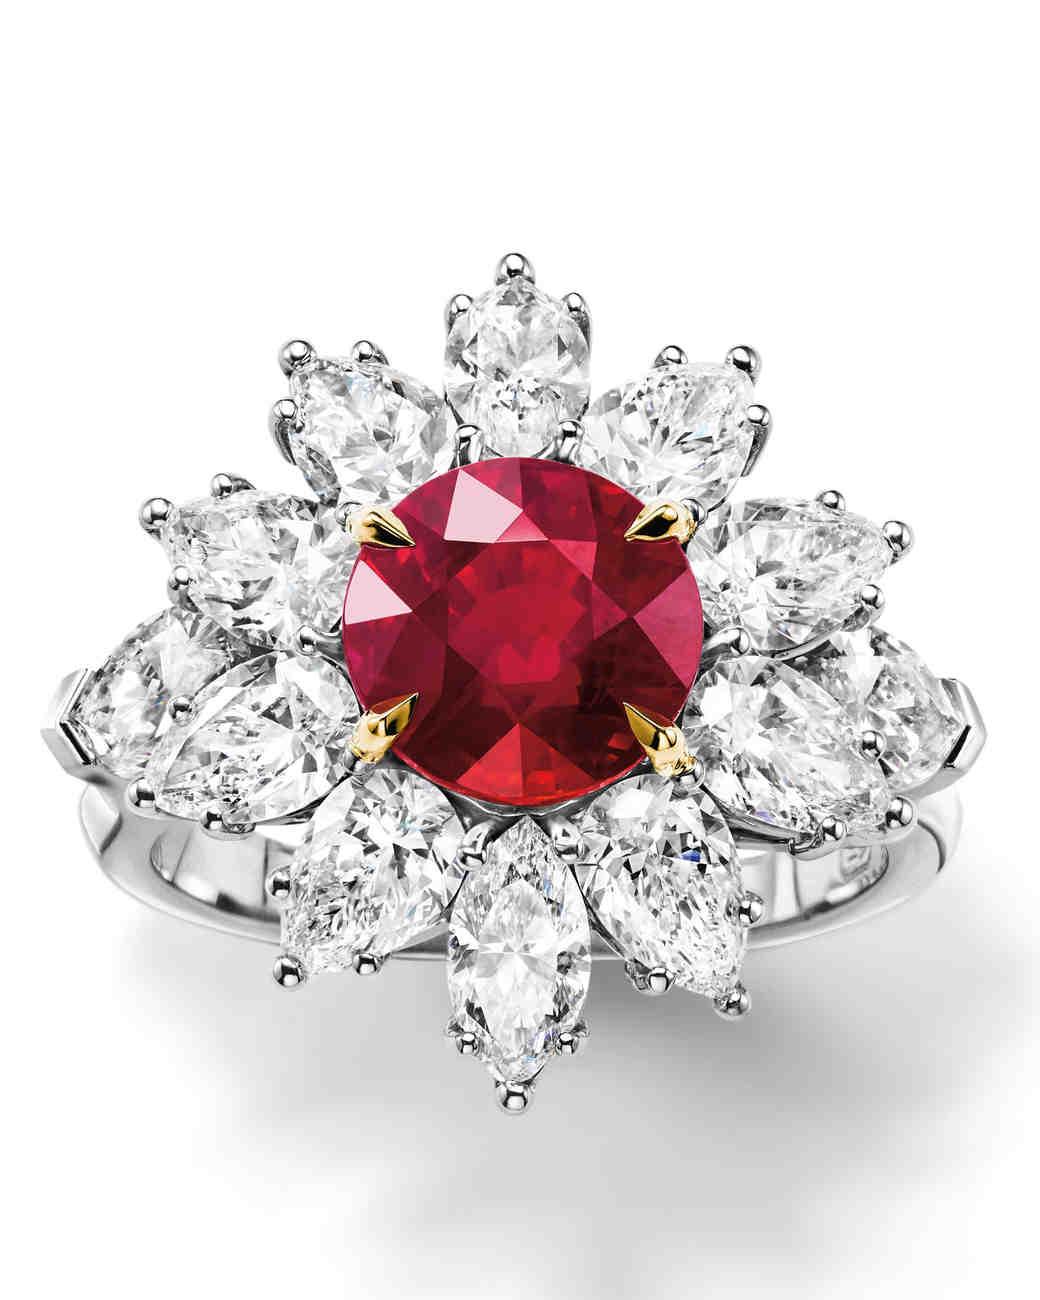 celebrity-rings-harry-winston-eva-longoria-0316.jpg